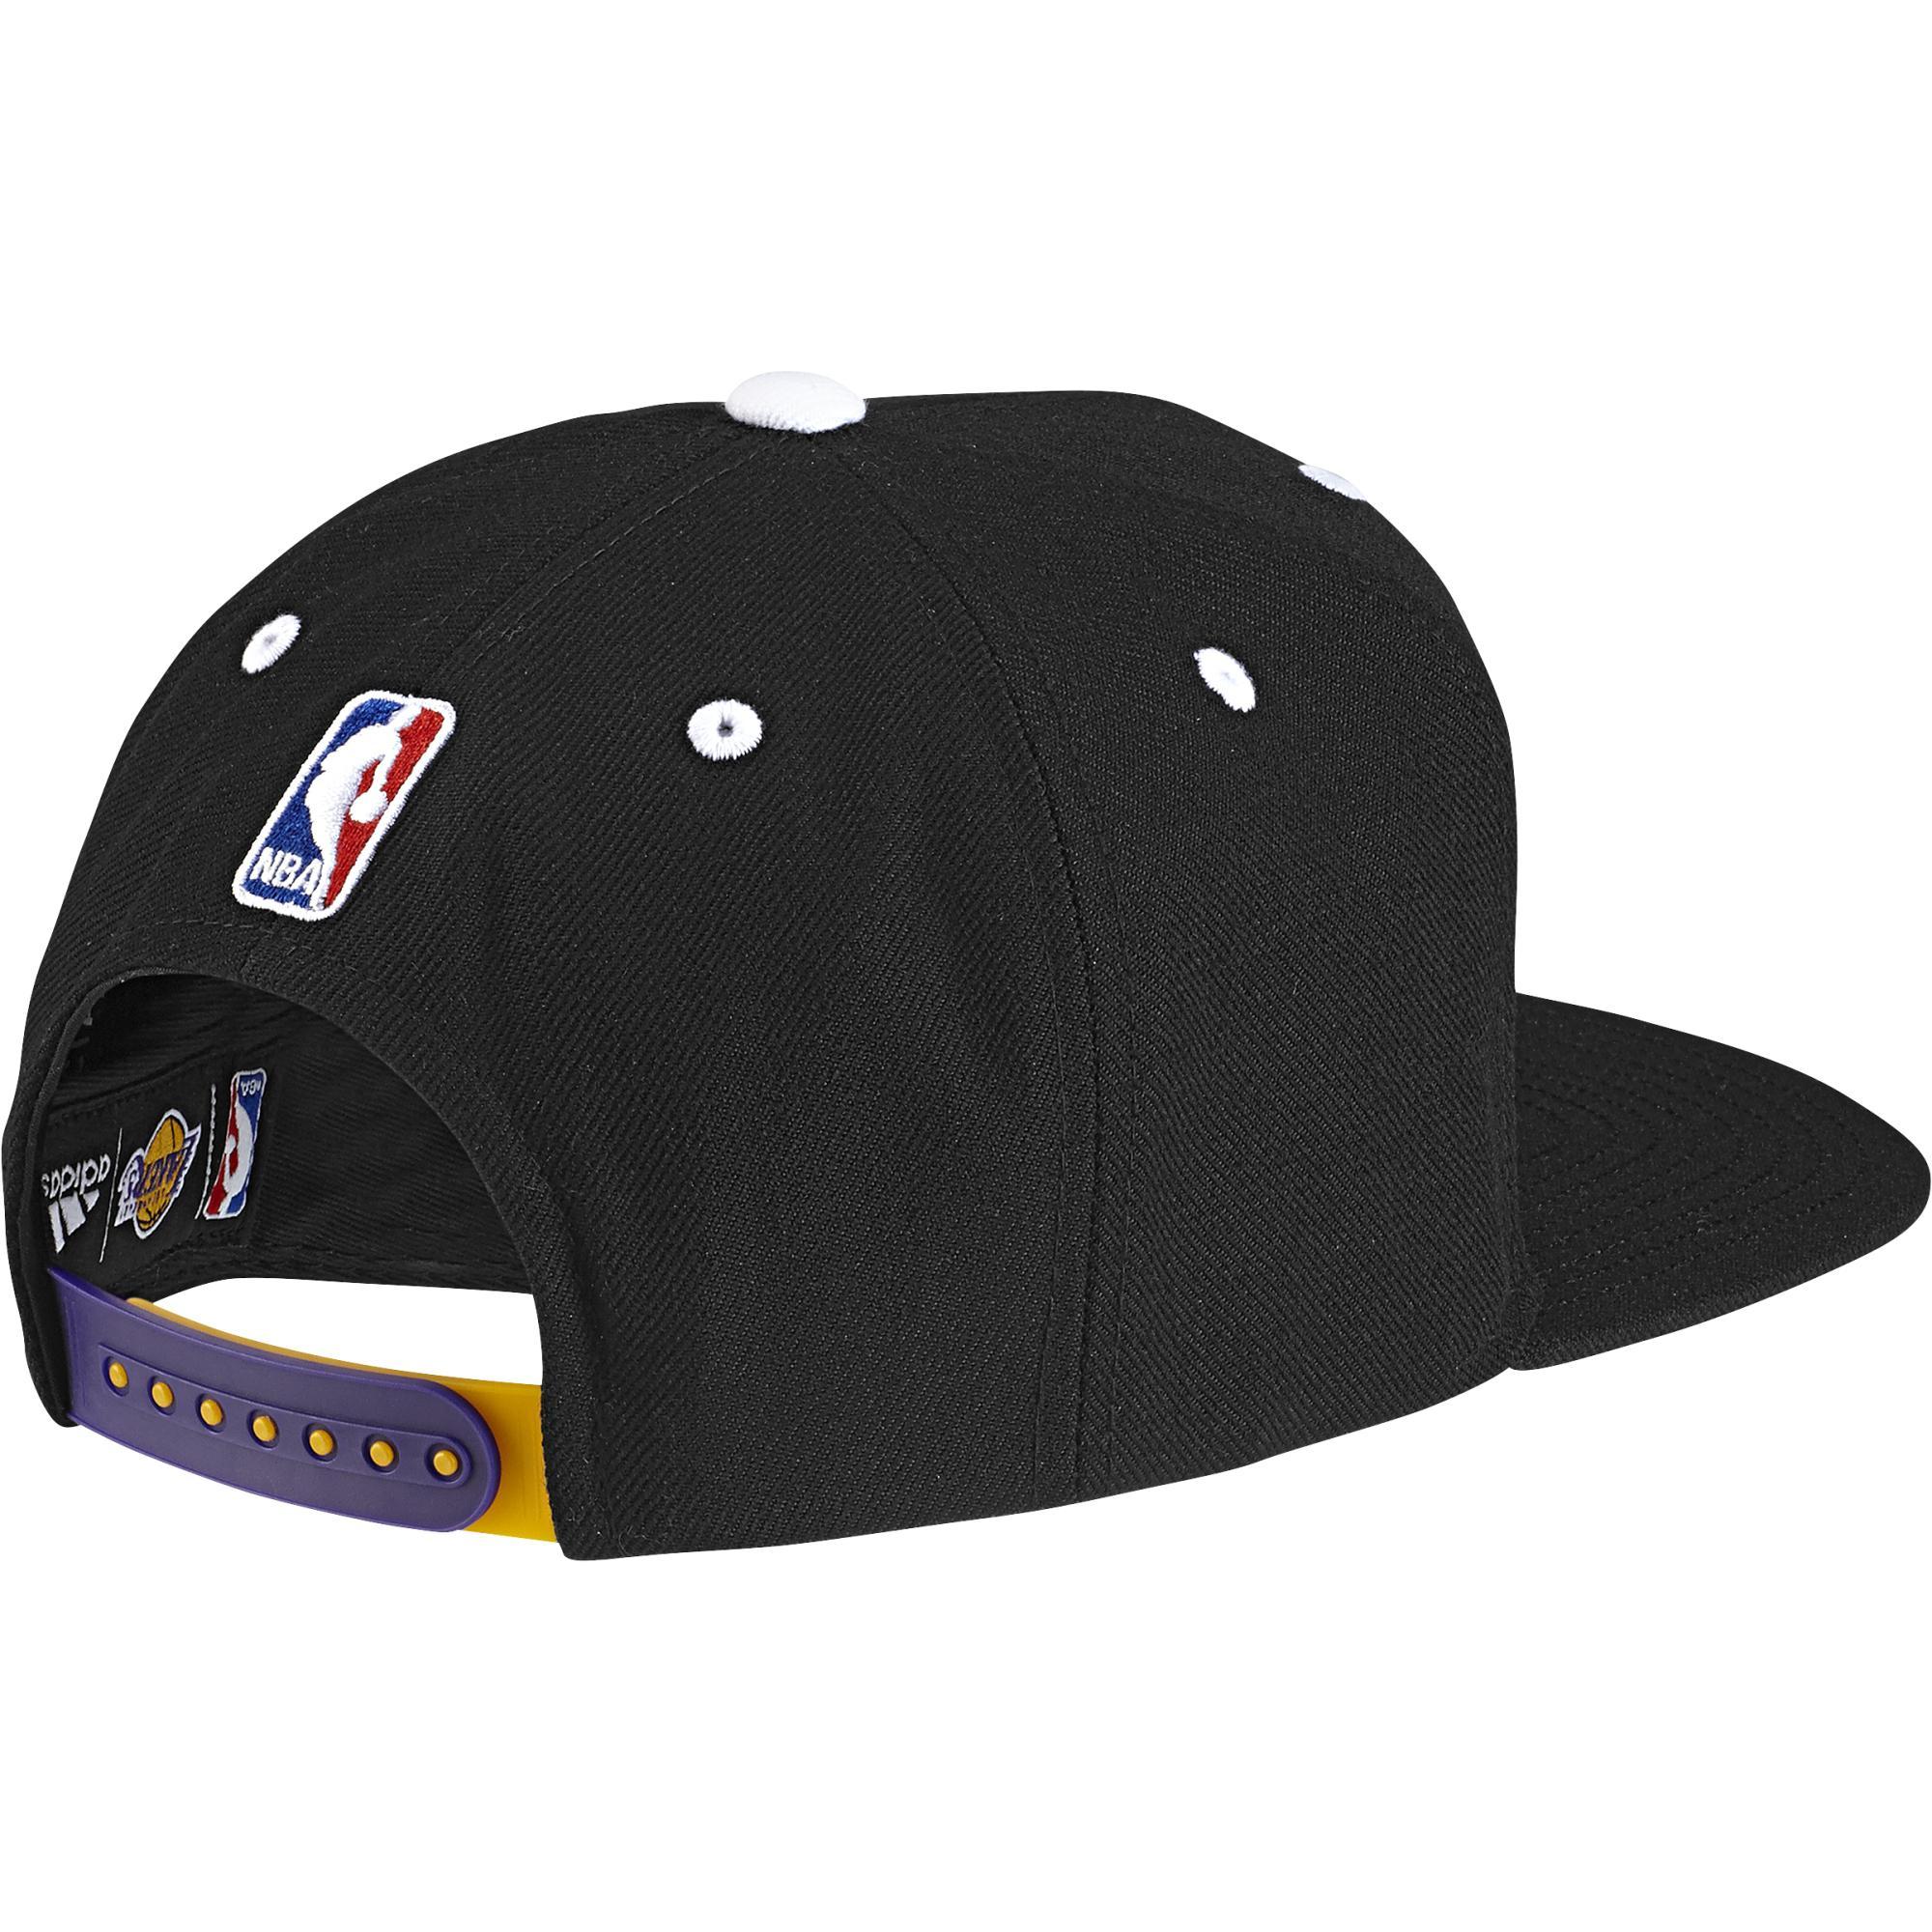 403adc322fb9 Adidas NBA Gorra Los Angeles Lakers Anthem Hat (negro)